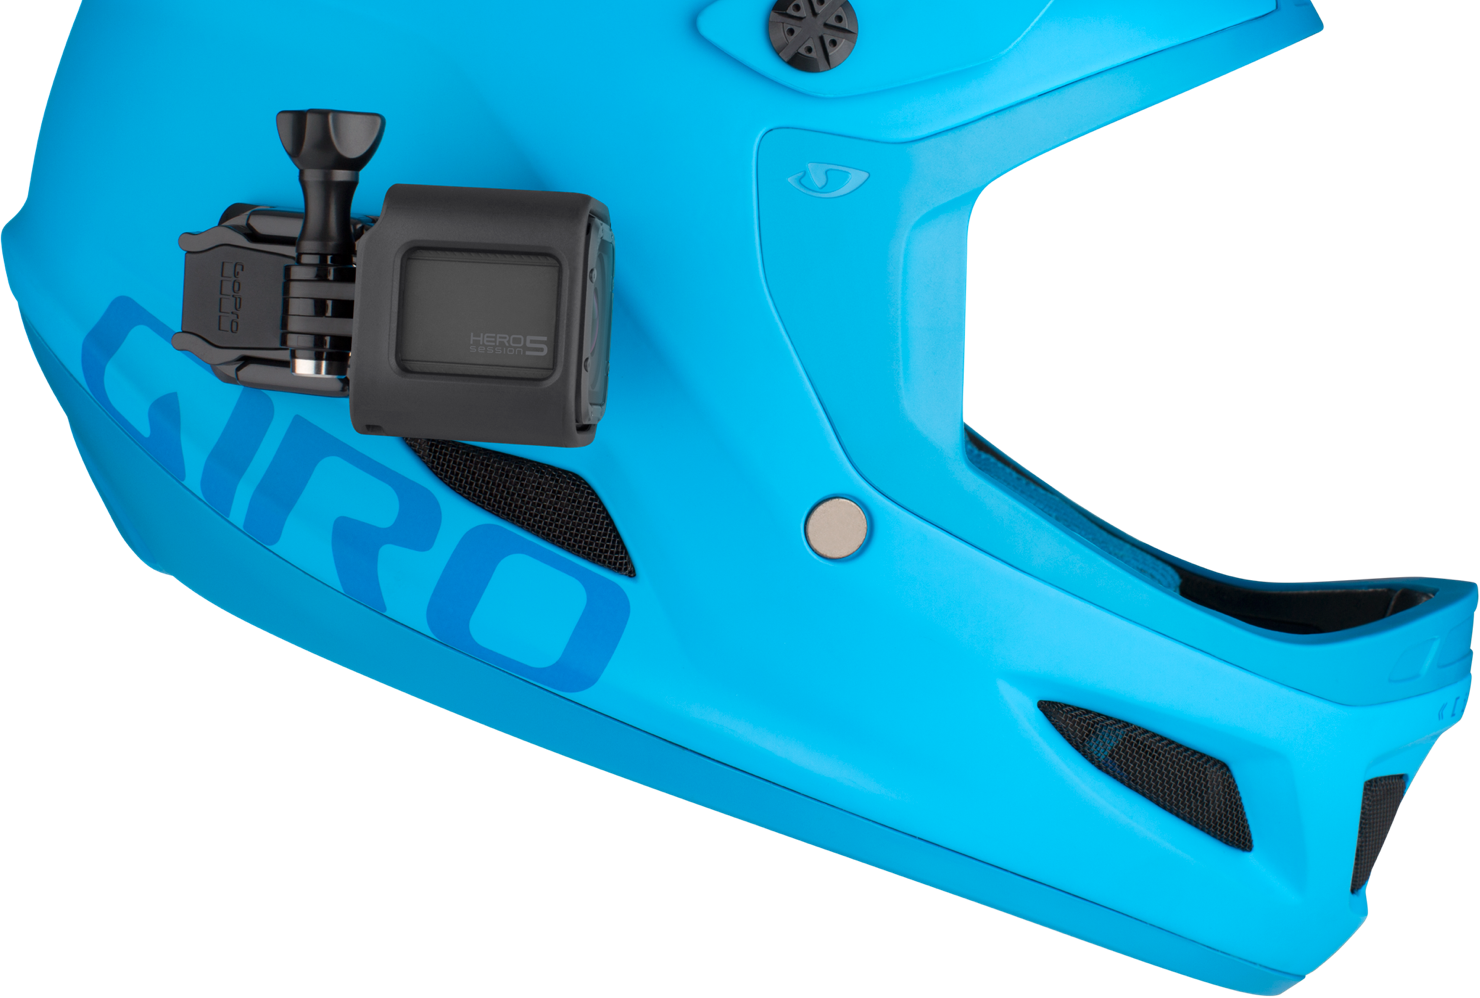 hero5-session-lpf-270-low-profile-helmet-swivel-mount-piu.png